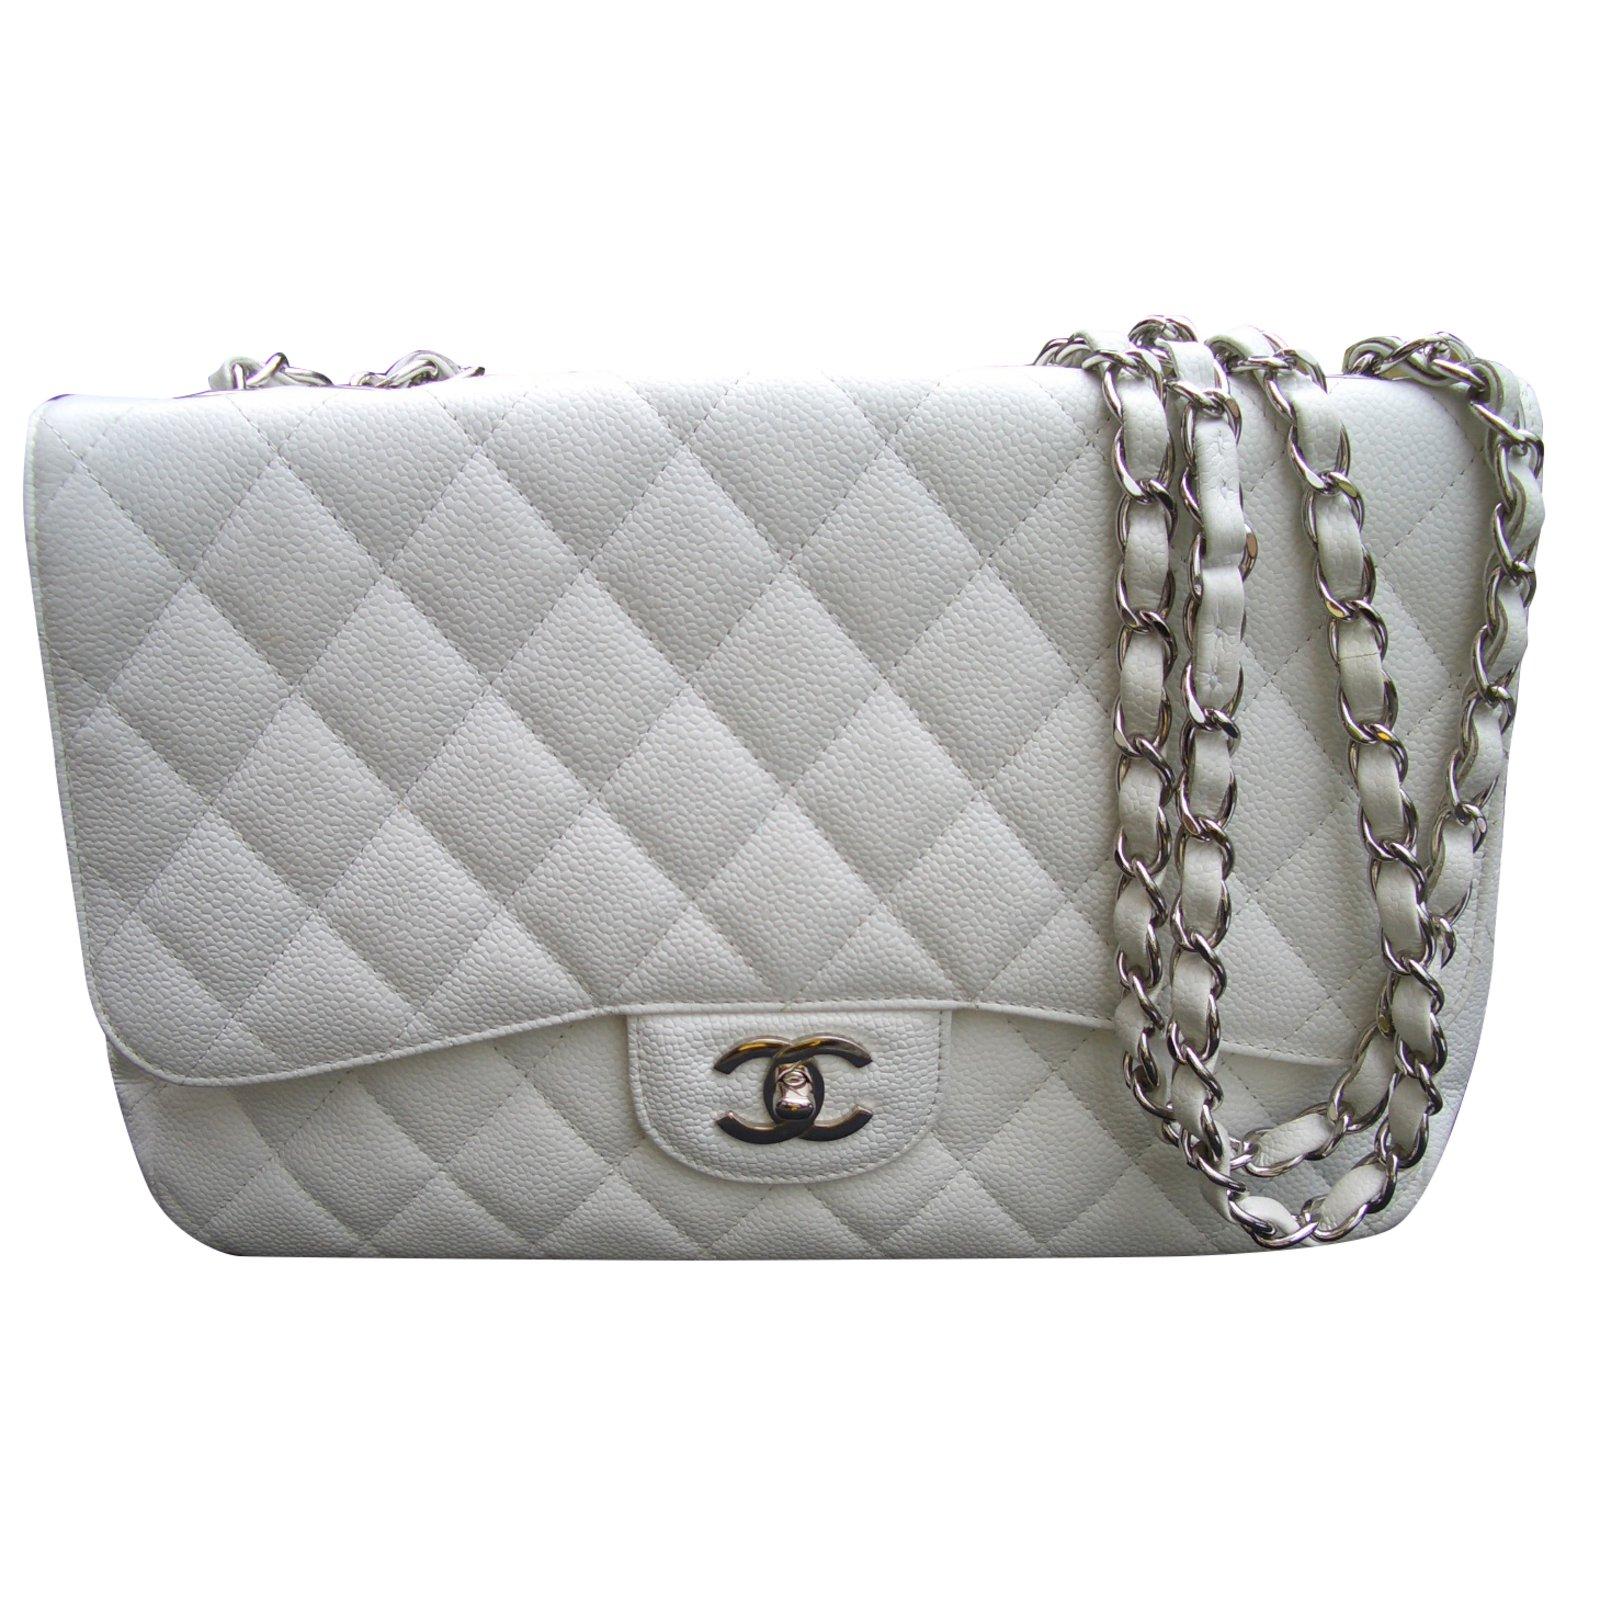 7b0027ceaf96 Chanel Handbags Handbags Leather White ref.73319 - Joli Closet